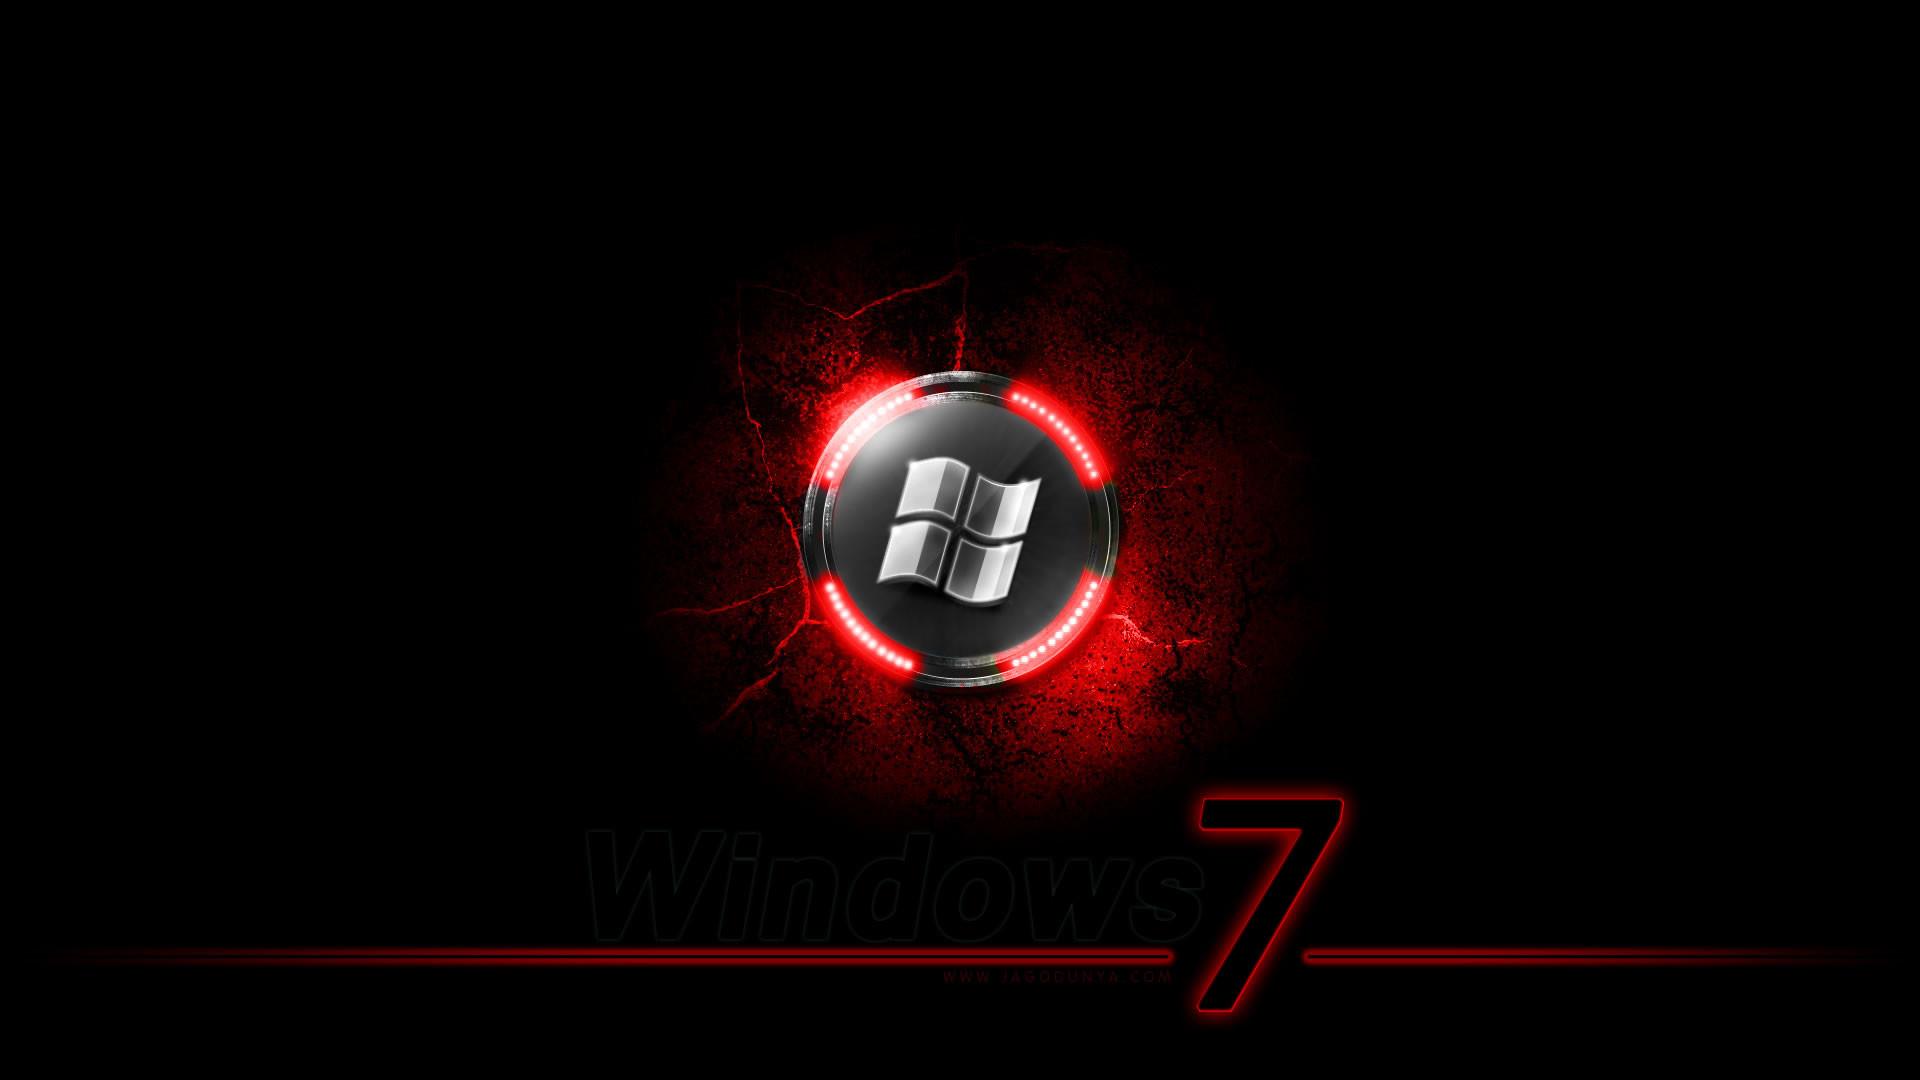 Black Windows 7 Wallpaper HD